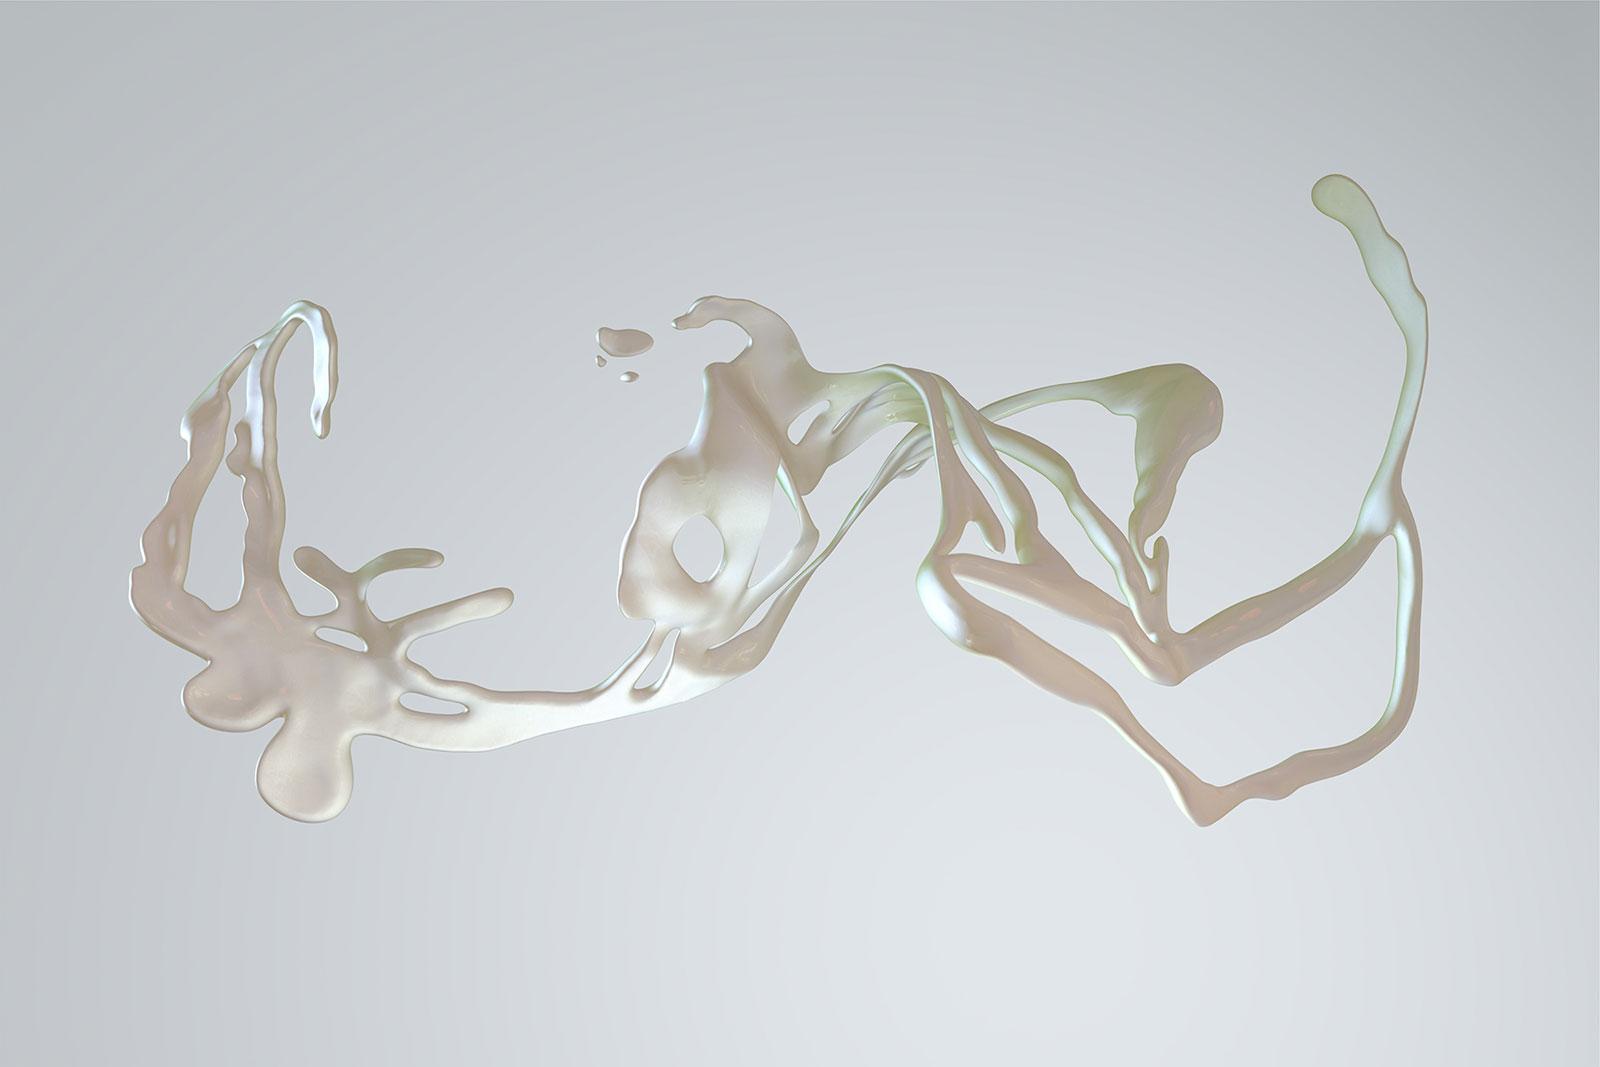 Postpainting I 07, CGI Fine Art Print, 107 x 160 cm, 2011